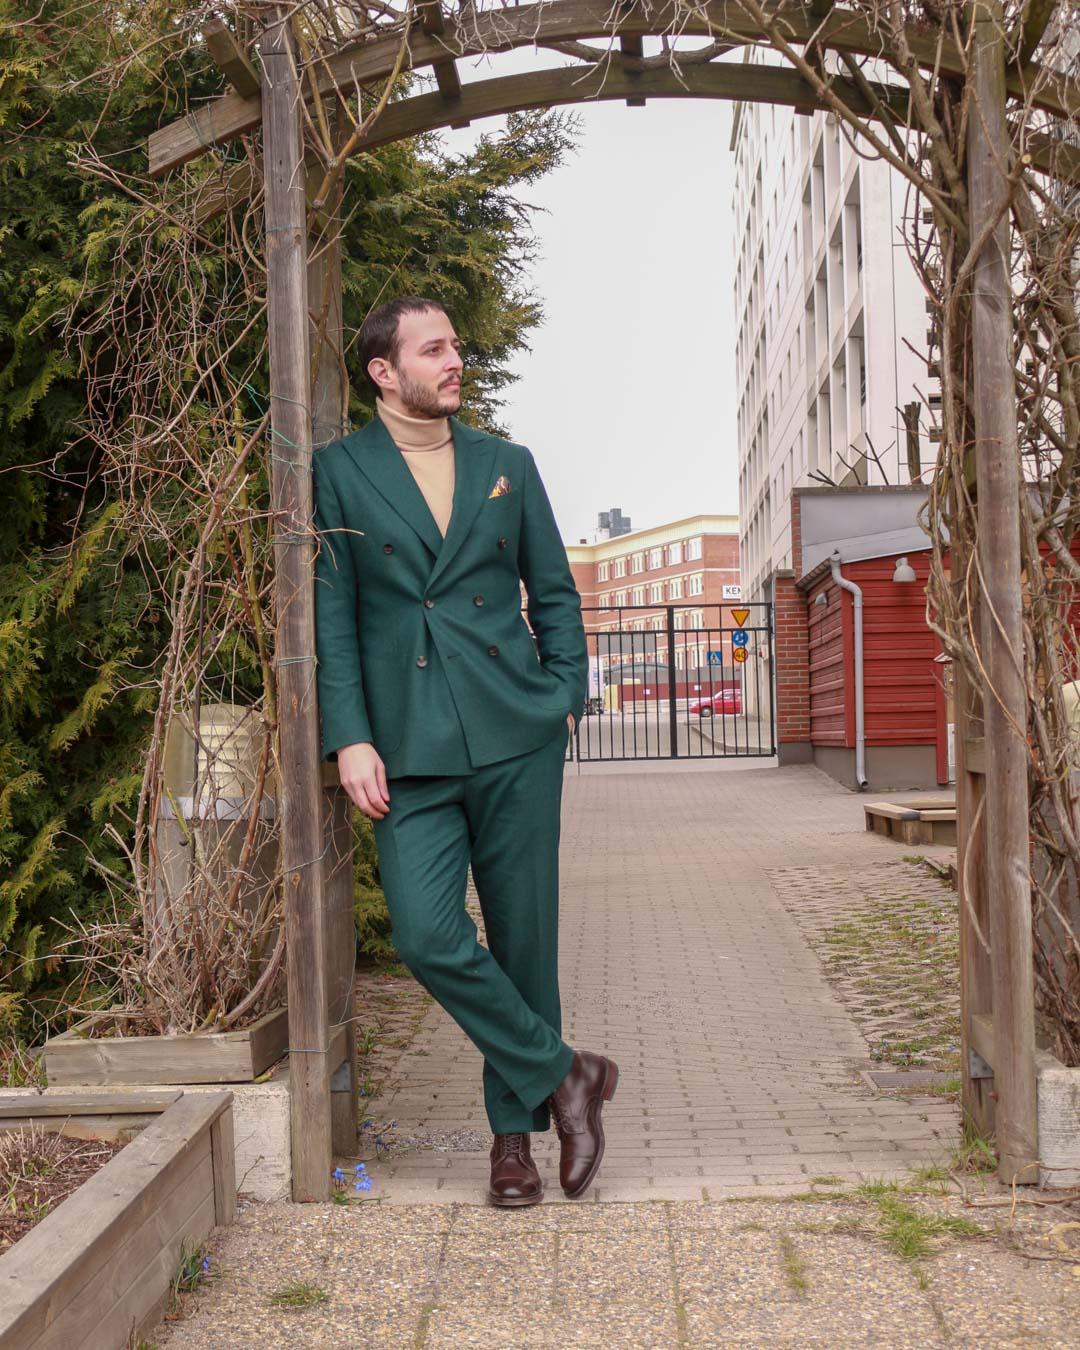 Soft Goat Turtleneck in Green Suit